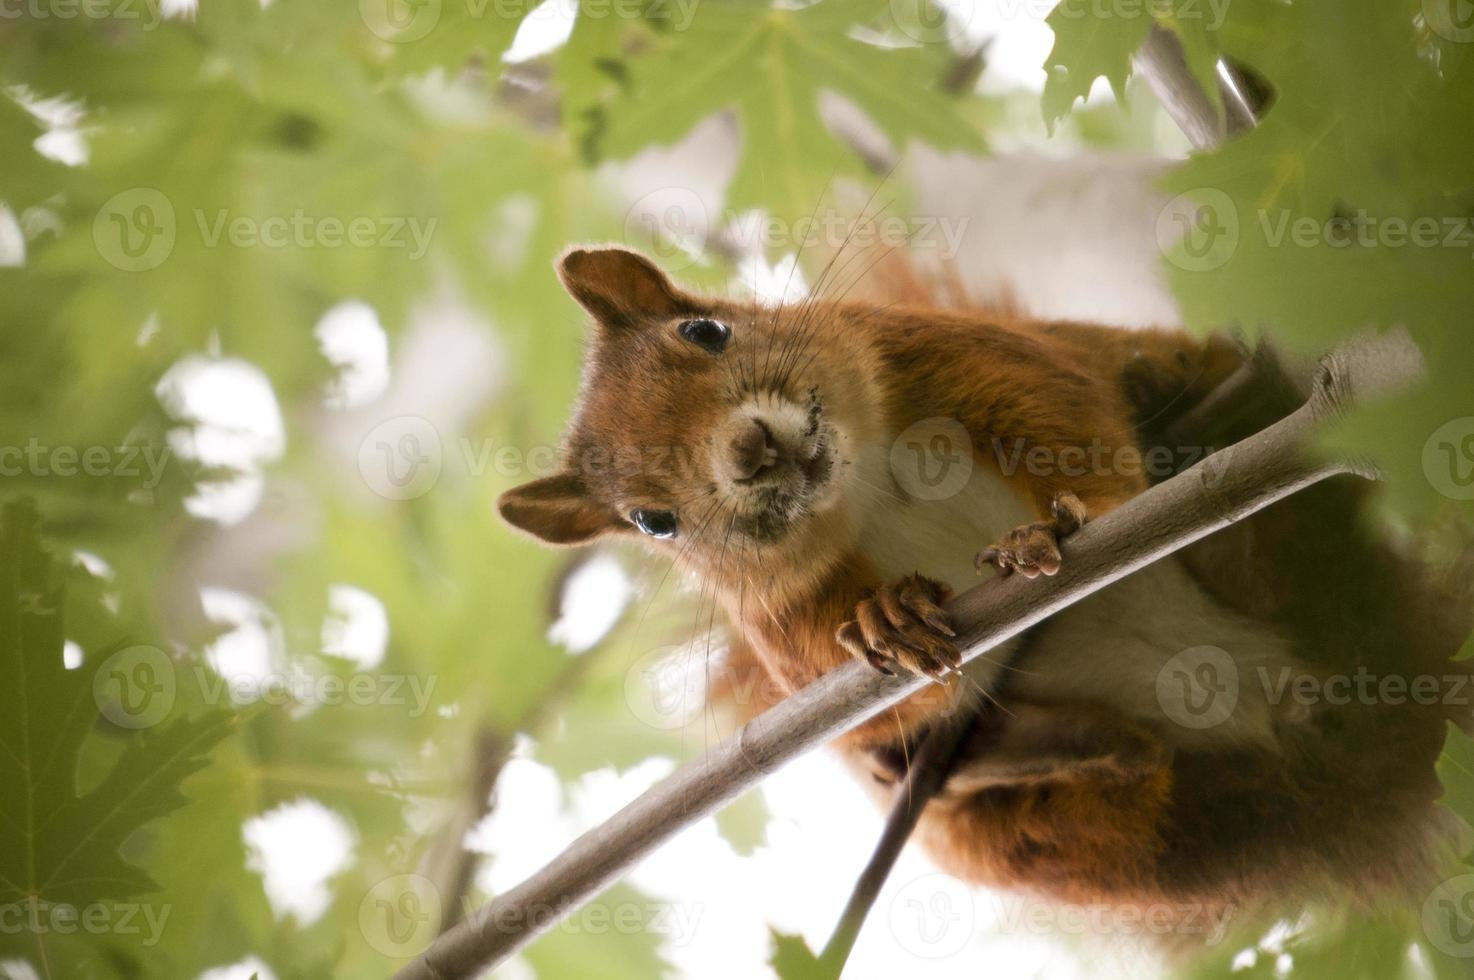 ekorre i ett träd foto